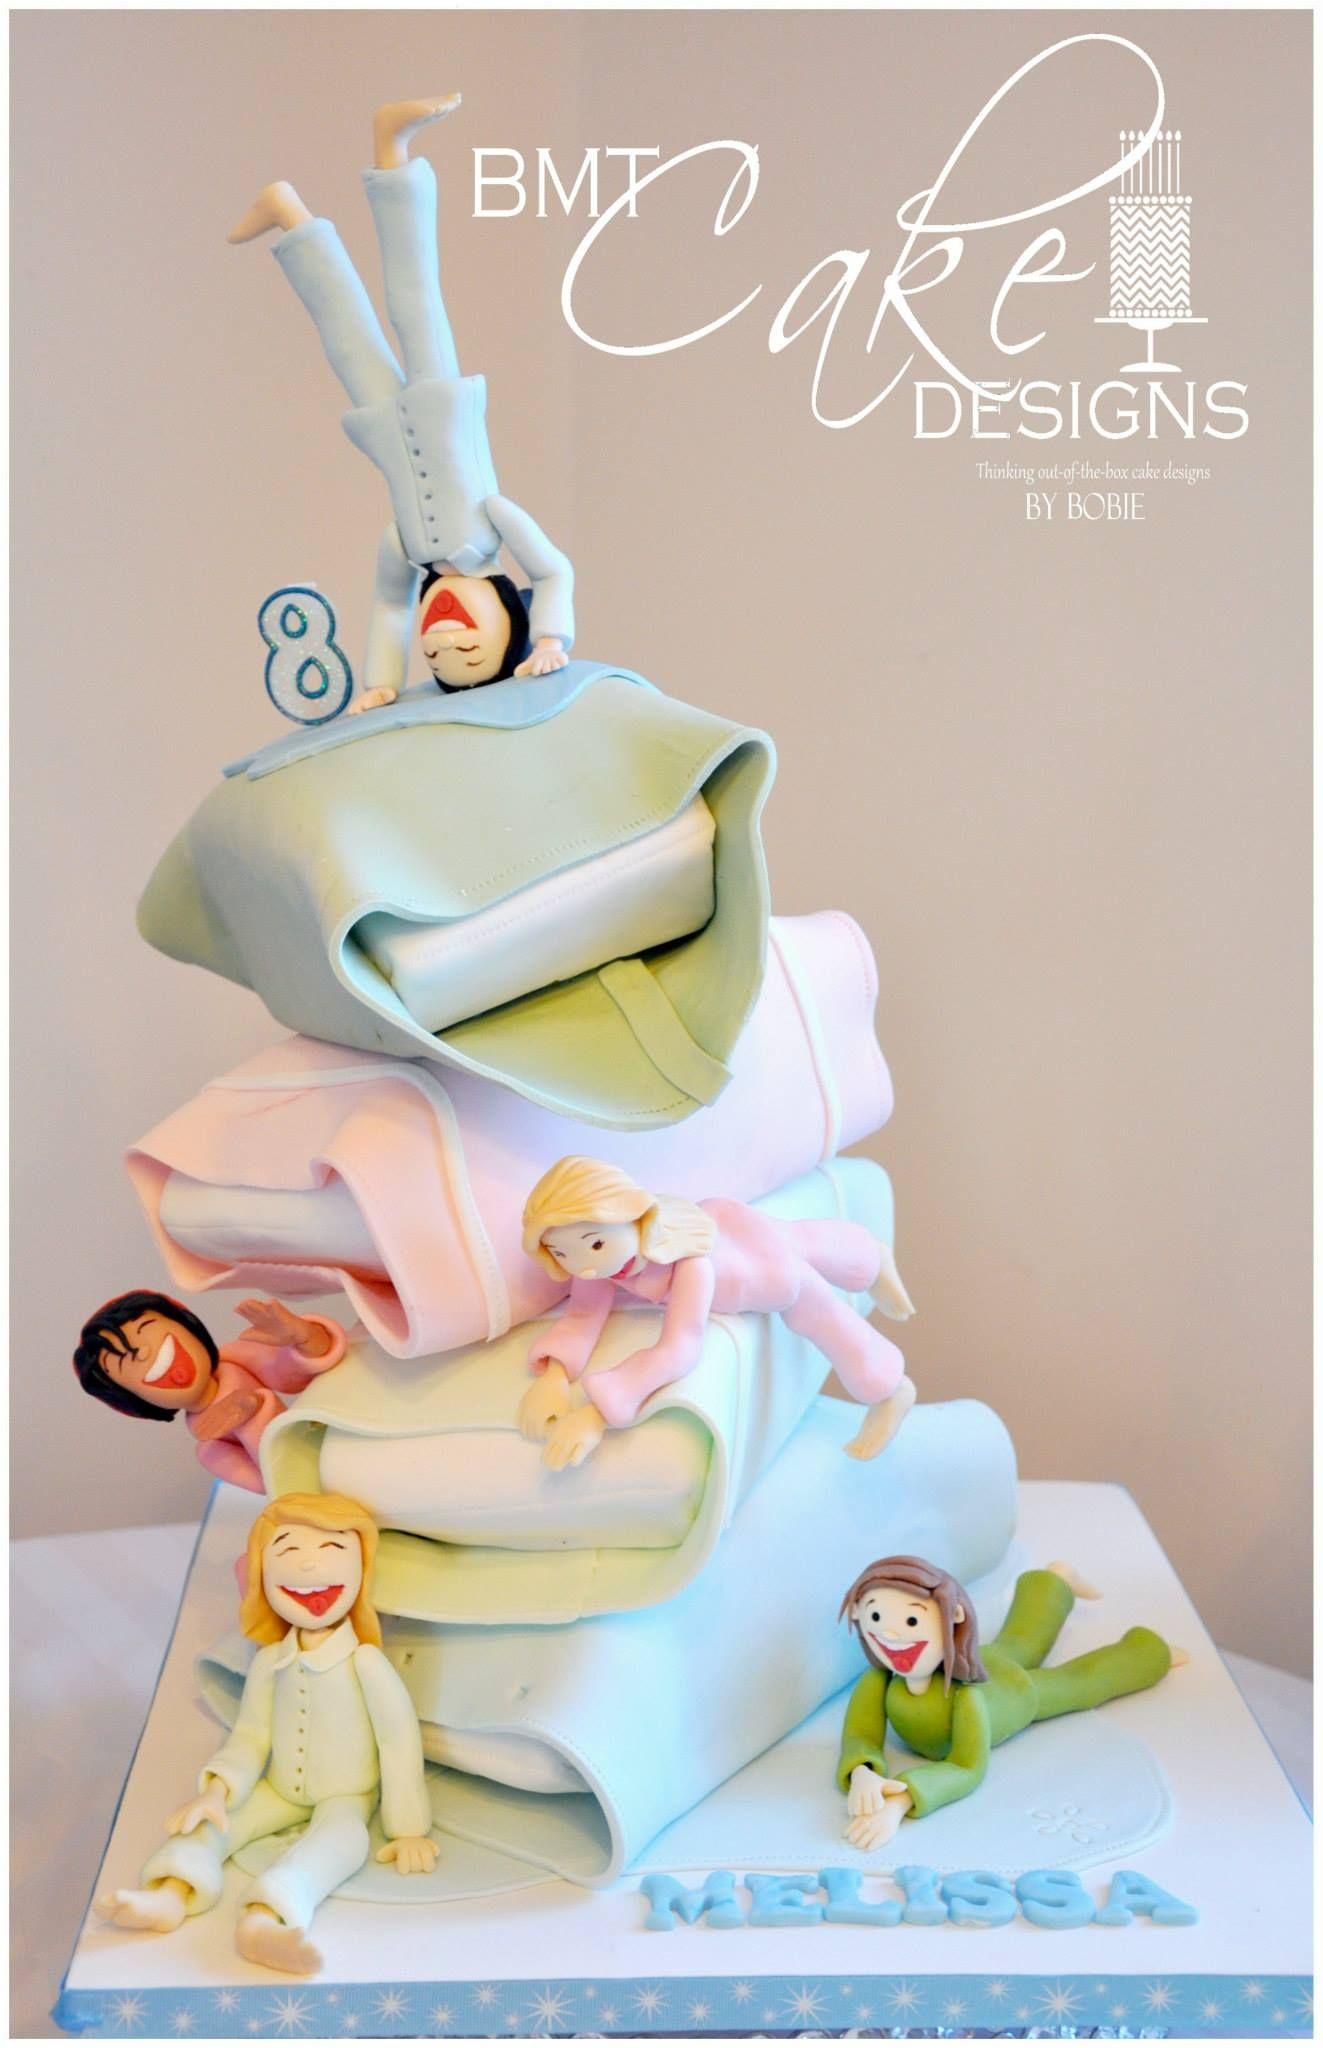 Astonishing Out Of The Box Cake Design Slaapfeest Taart Geweldige Taarten Funny Birthday Cards Online Inifodamsfinfo